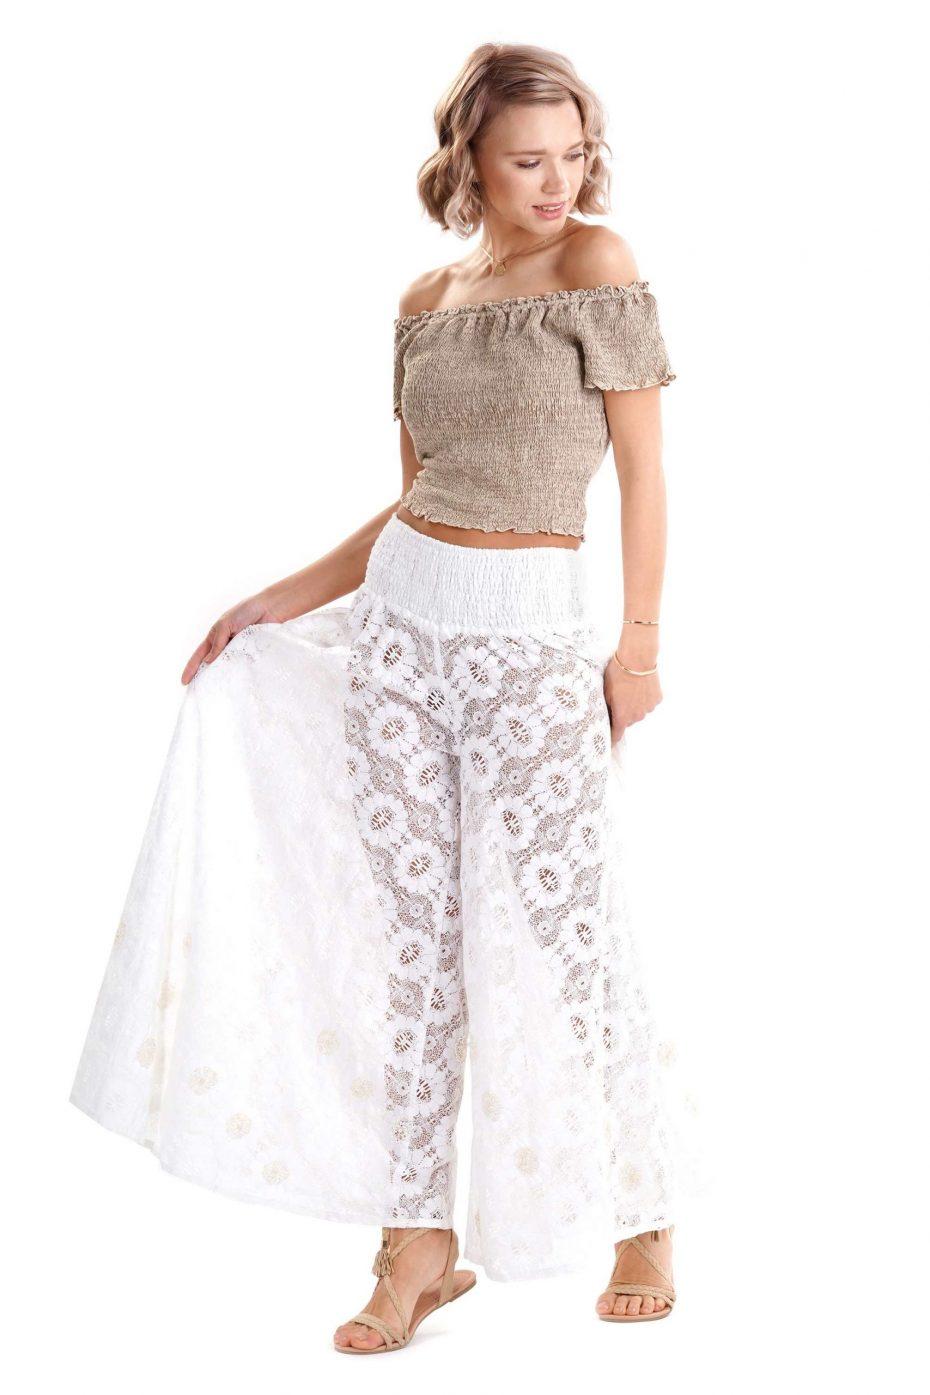 Pantalon Largo Croche Blanco Lace